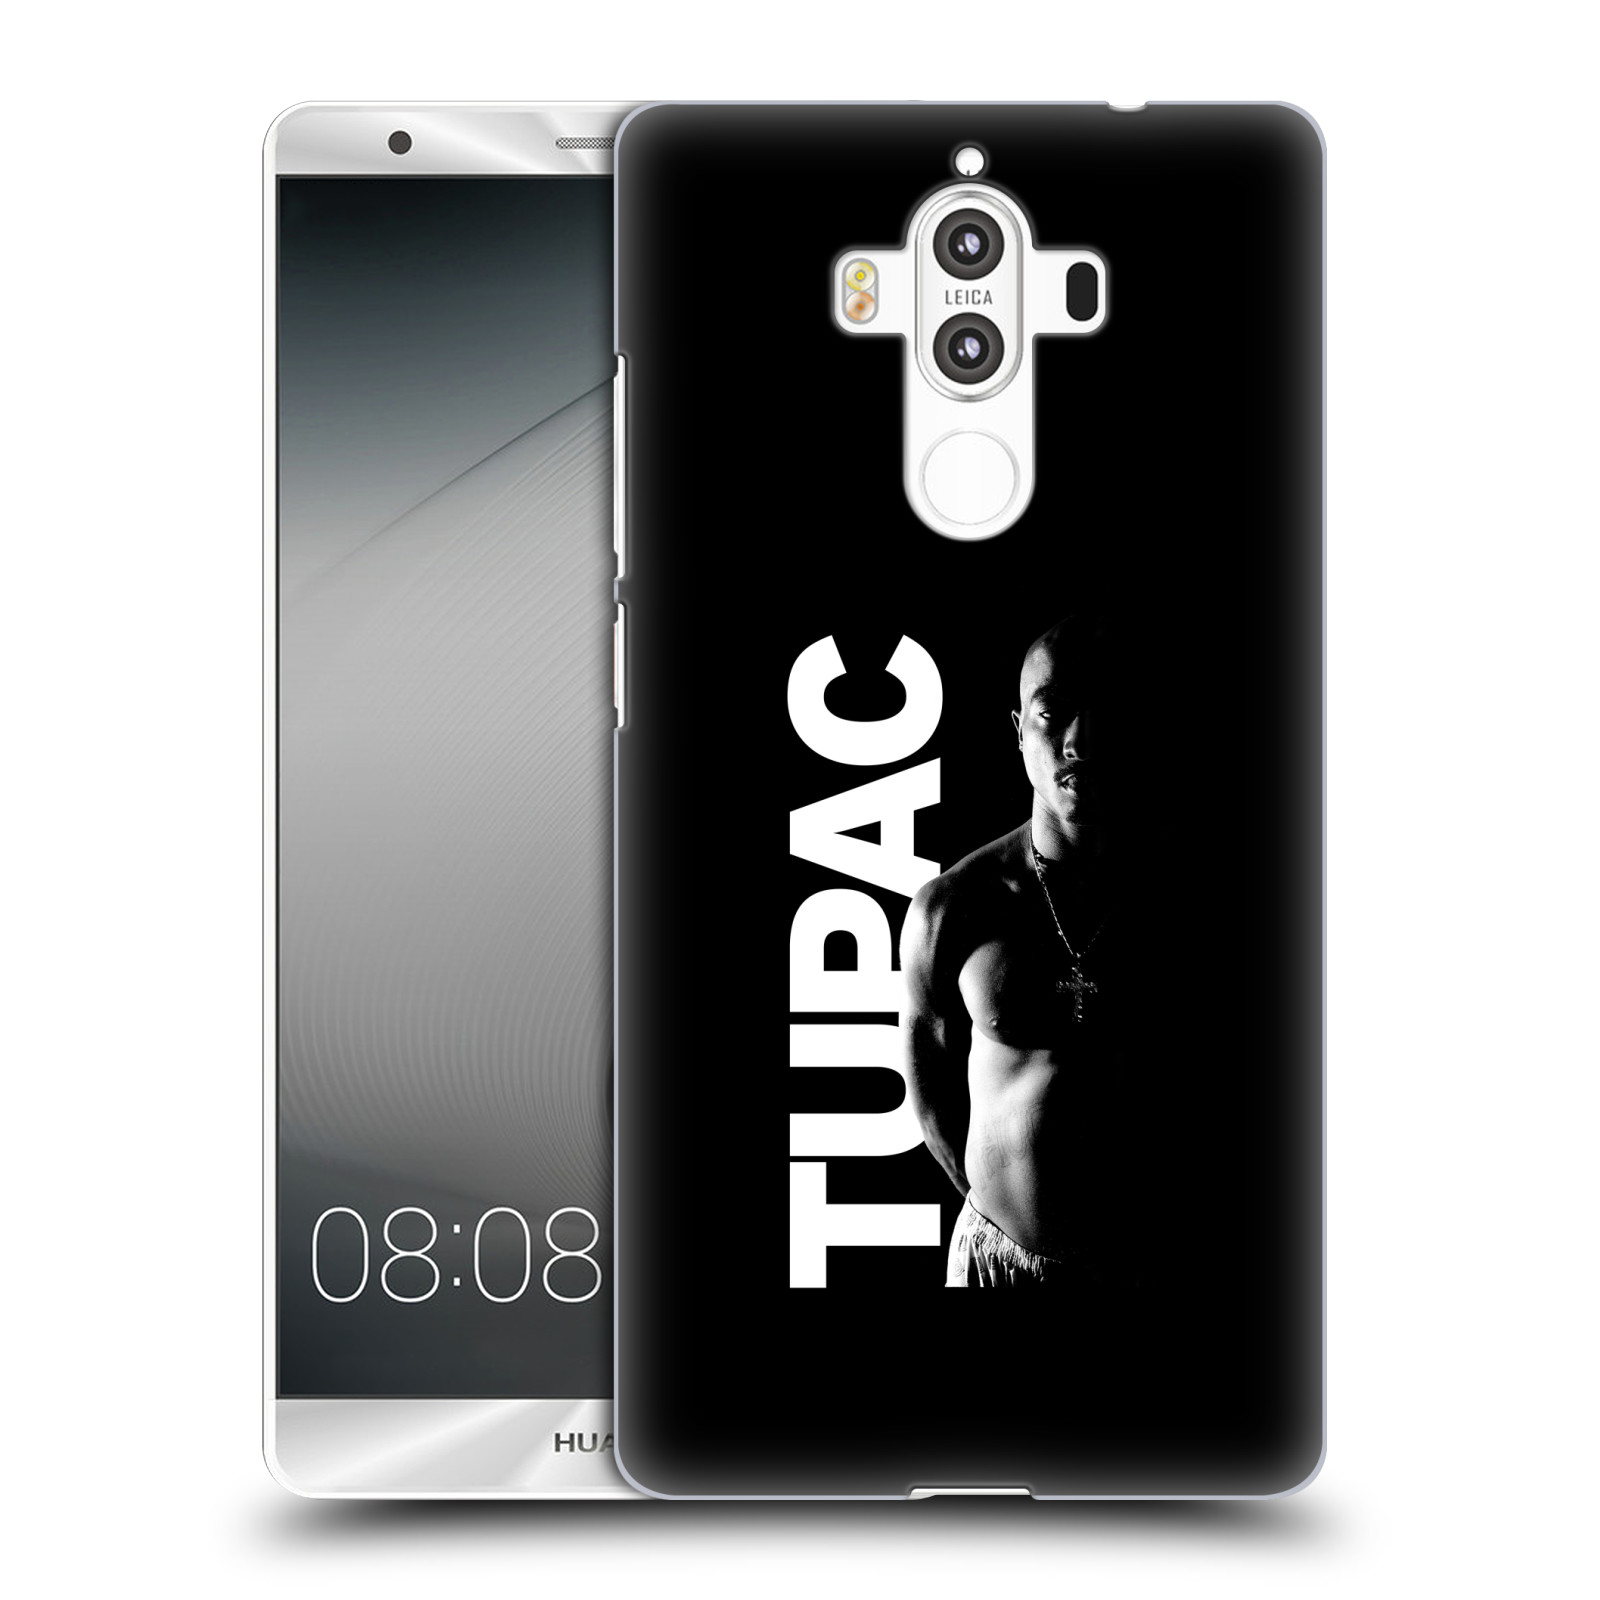 Plastové pouzdro na mobil Huawei Mate 9 - Head Case TUPAC - Black and White (Plastový kryt či obal na mobilní telefon s oficiálním motivem rappera Tupaca Amaru Shakura pro Huawei Mate 9 (Dual SIM))